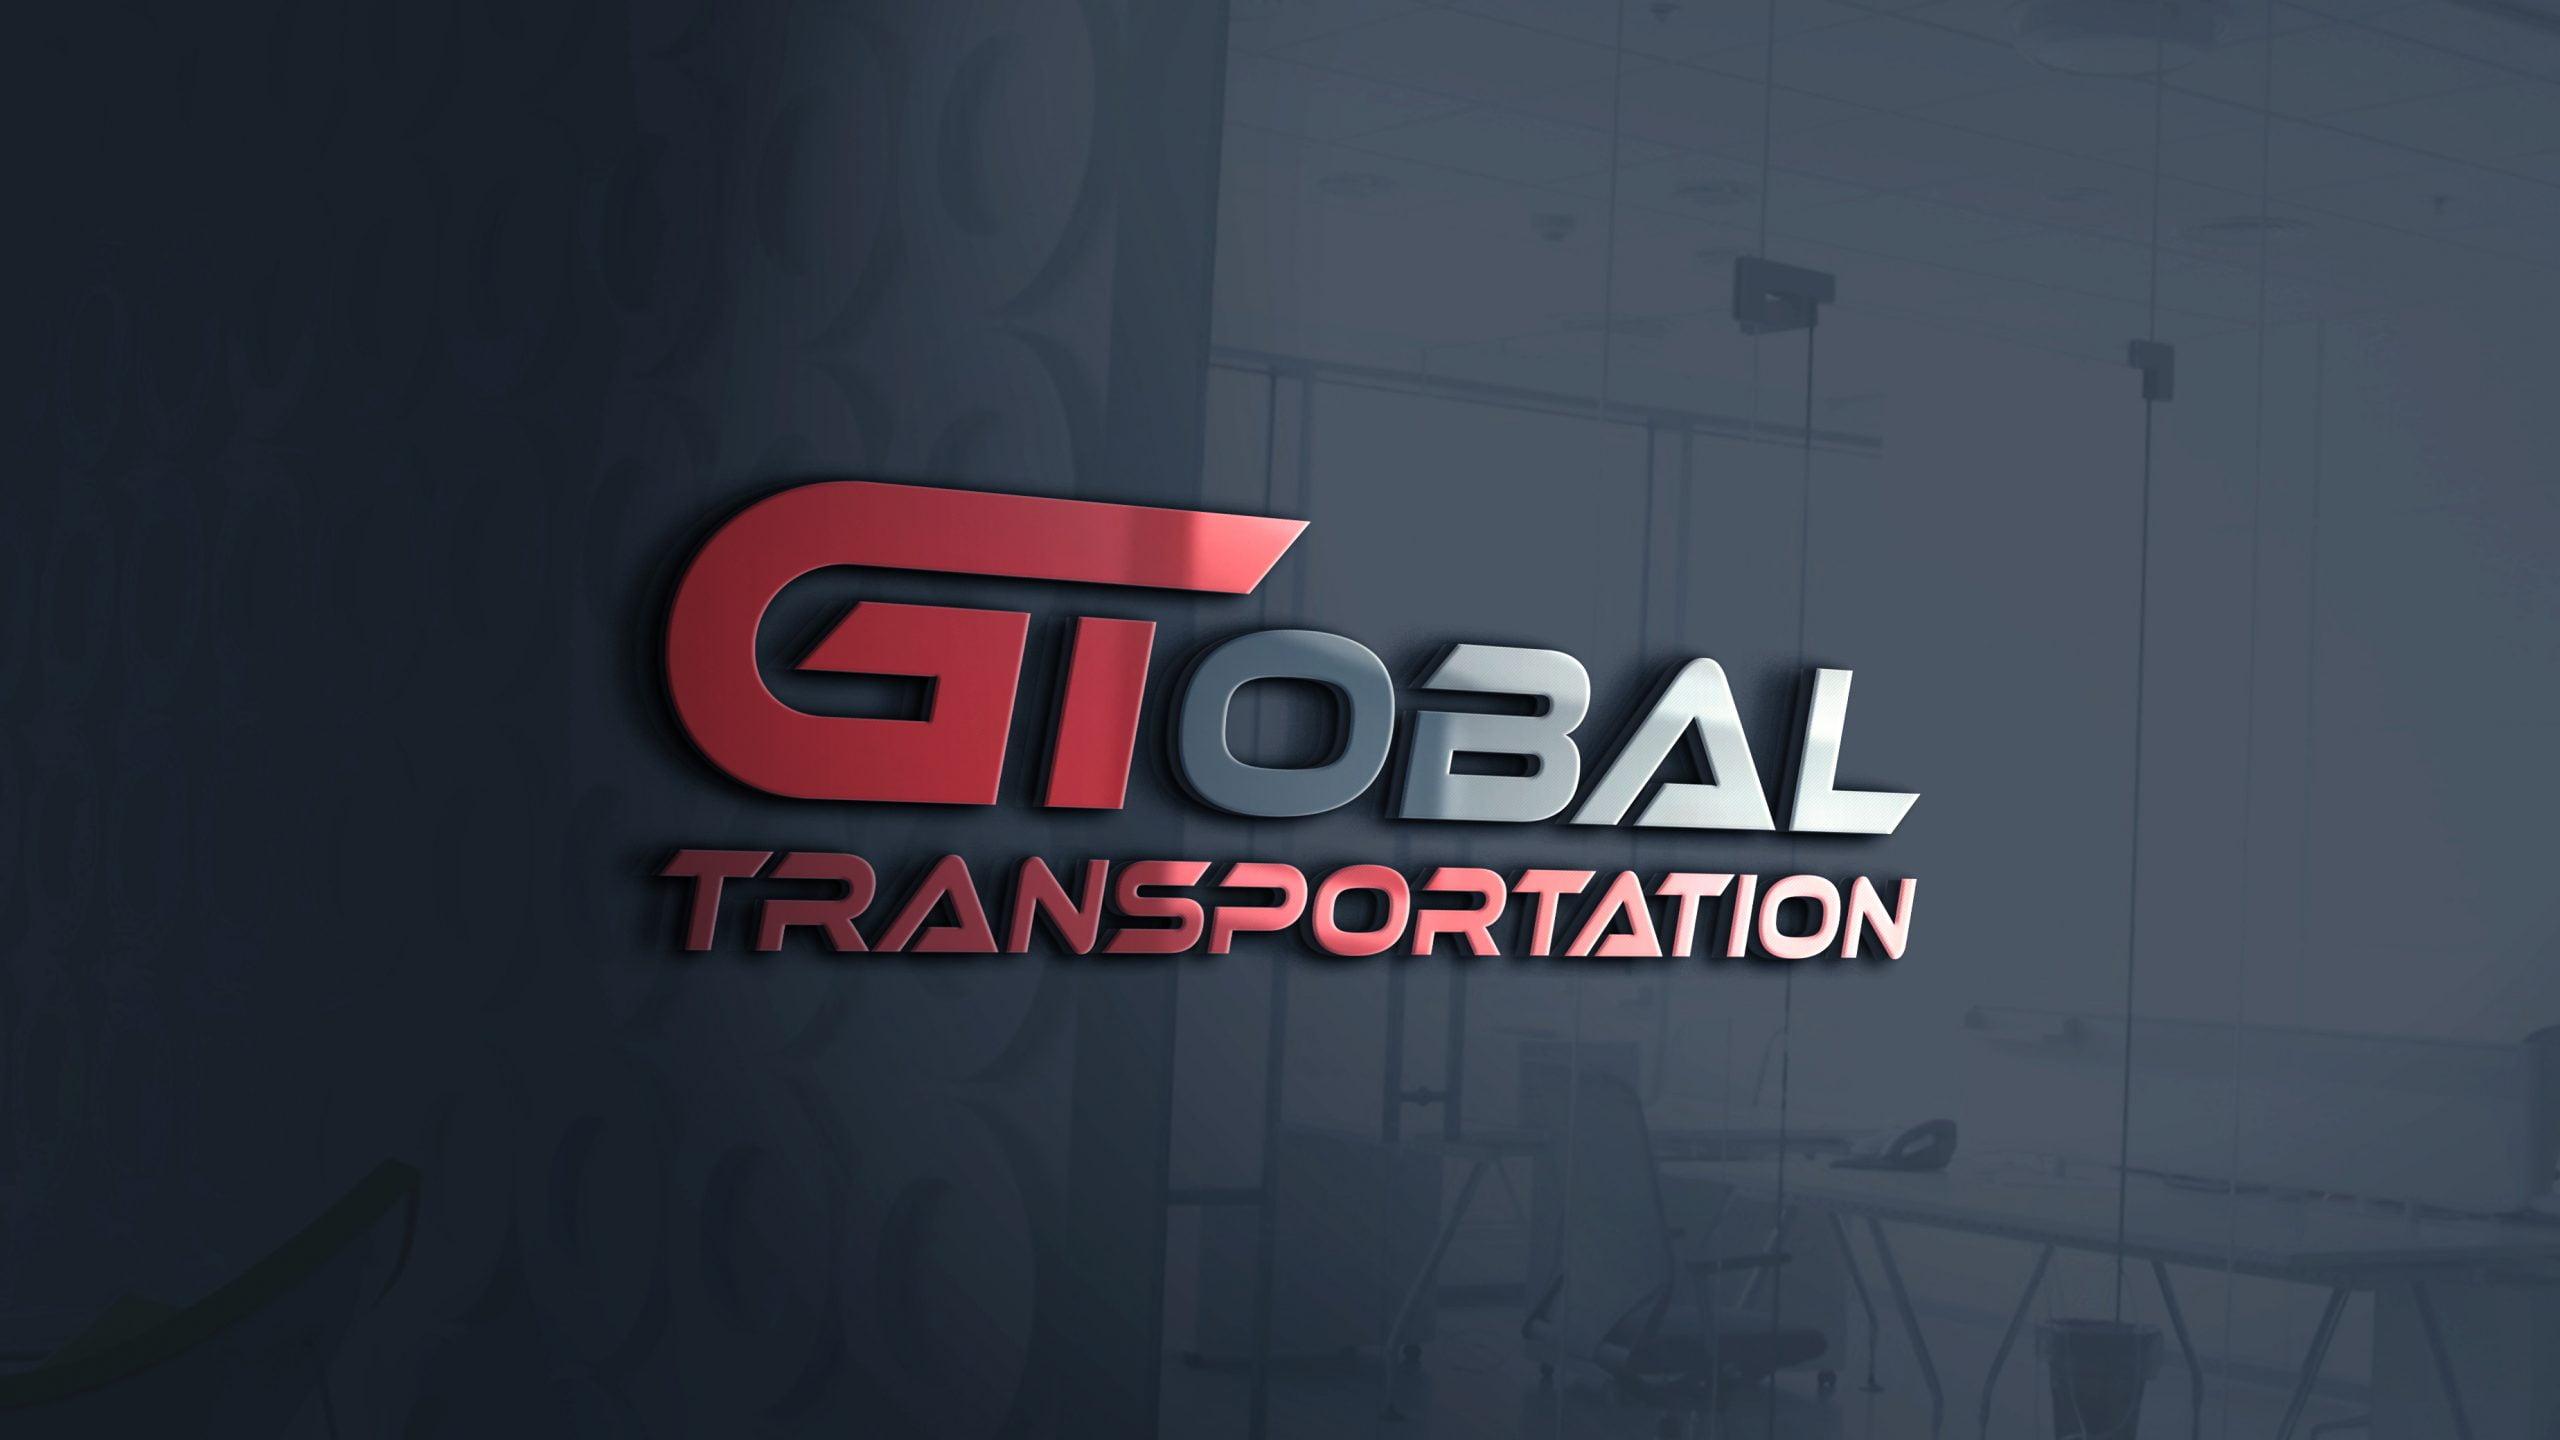 Transportation Logo Design on 3d glass window